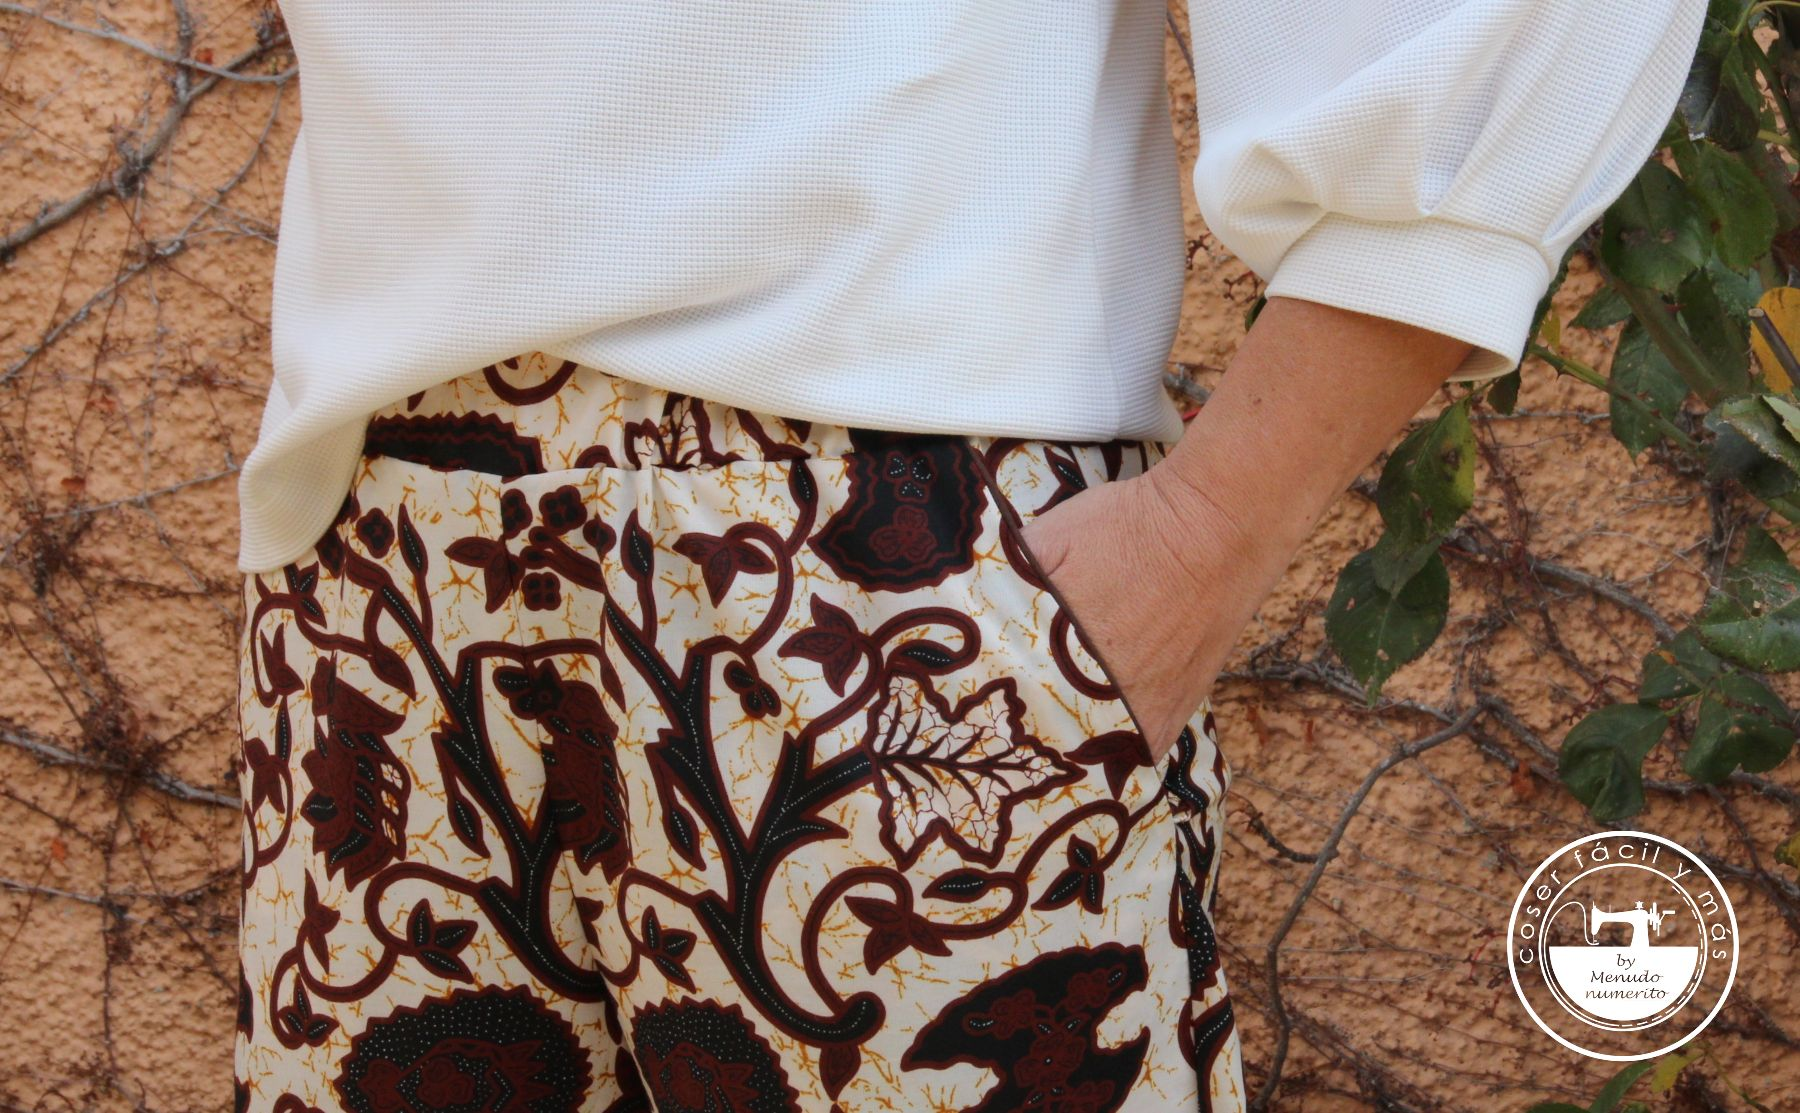 pantalon basico a medida coser facil blogs de costura tutorial